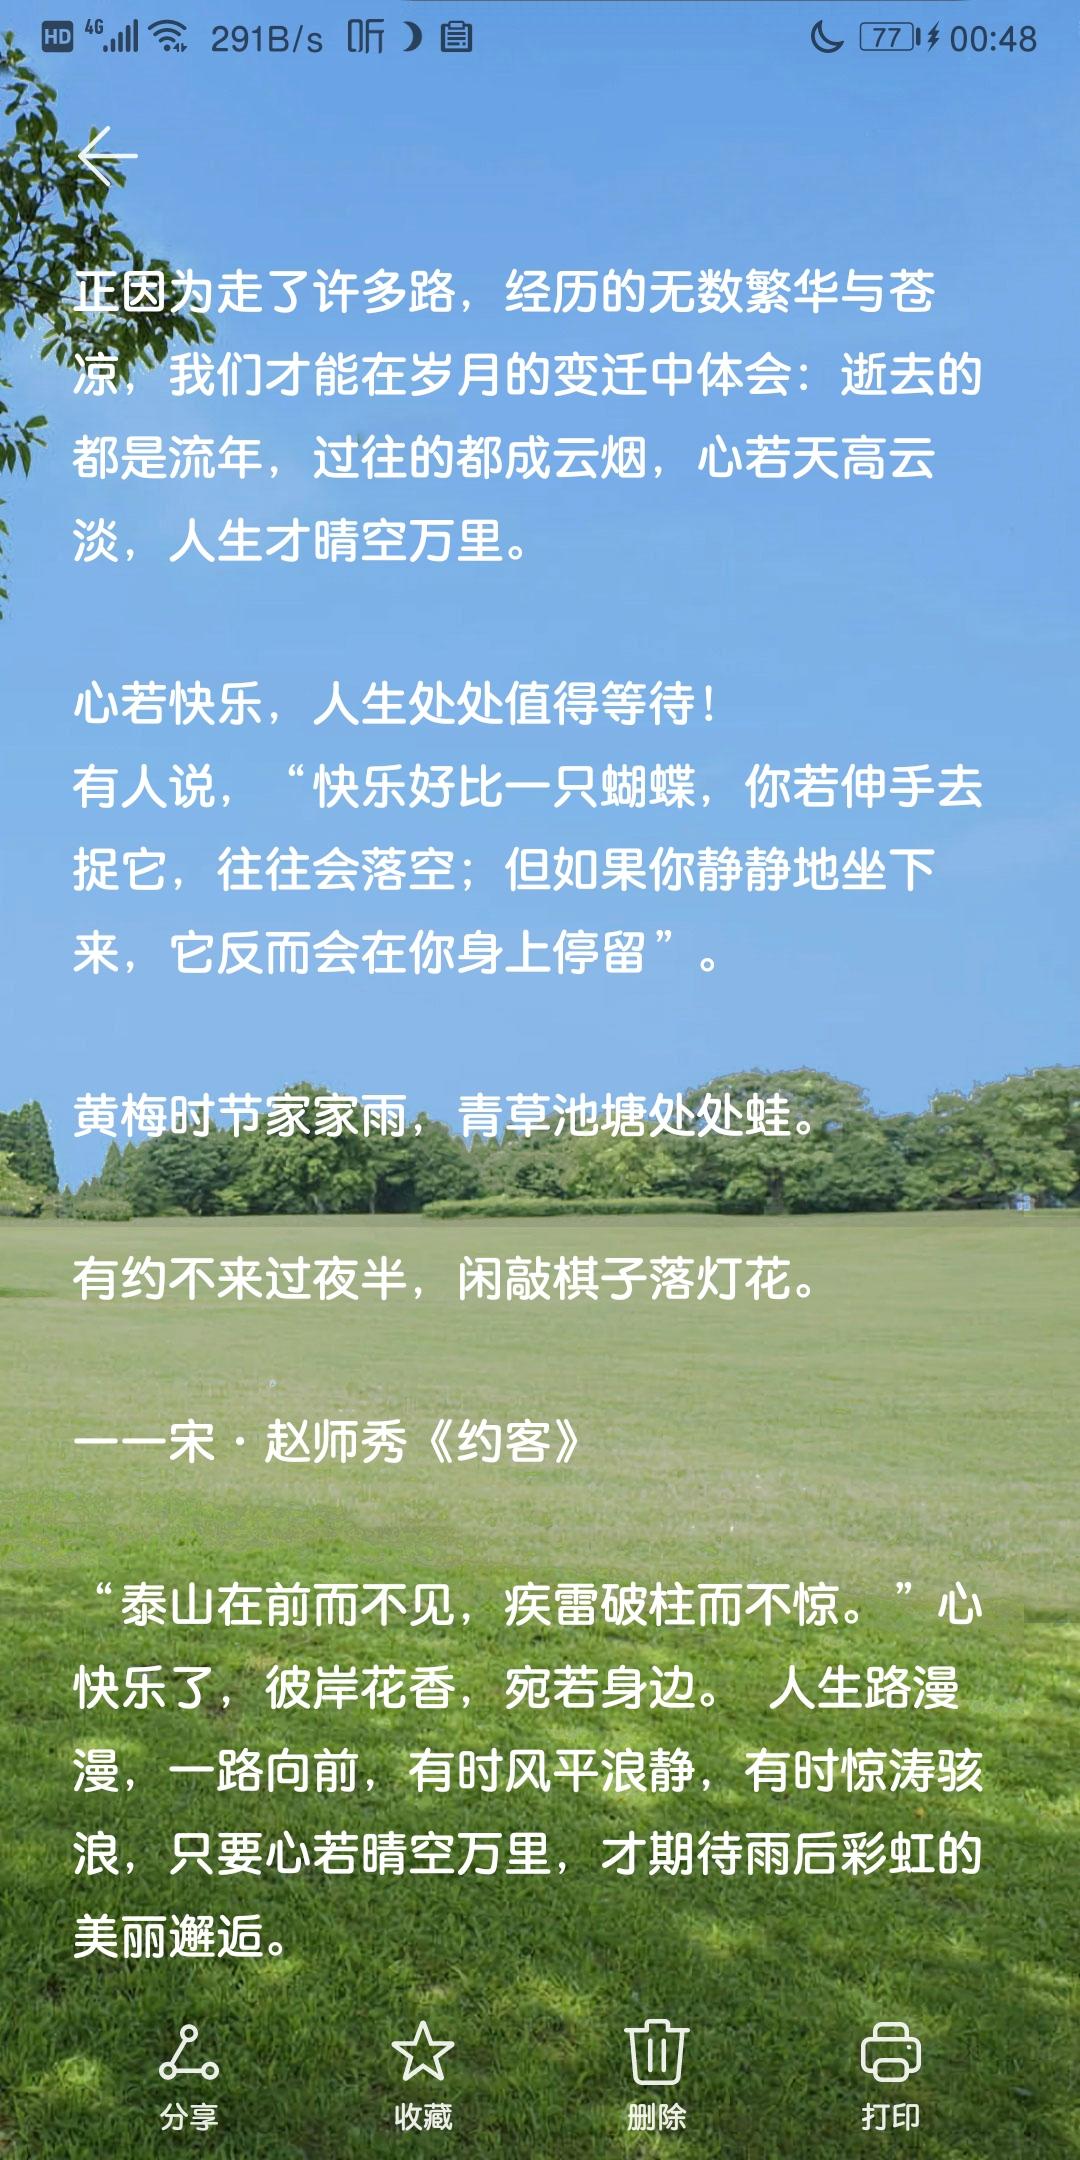 Screenshot_20200202_004827_com.example.android.notepad.jpg